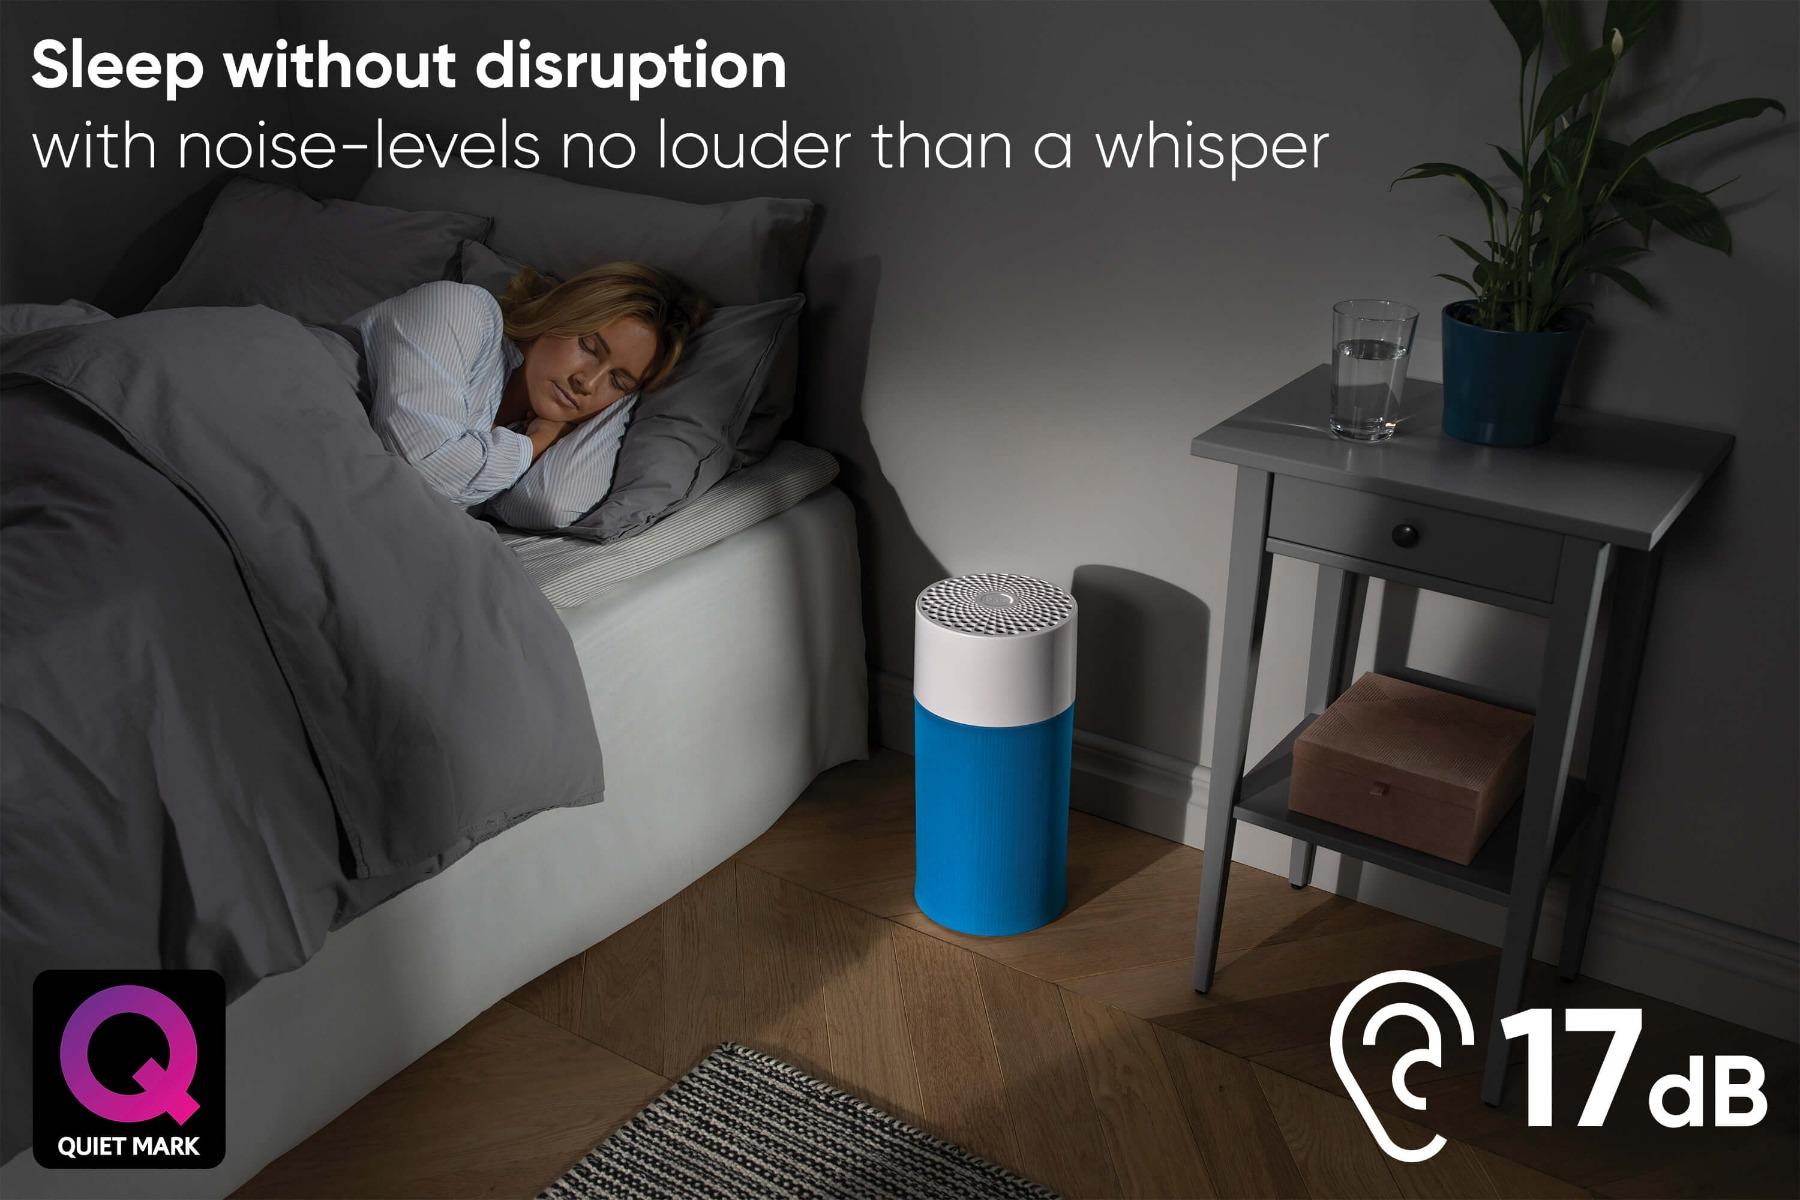 Blueair sleep without disprution quiet mark